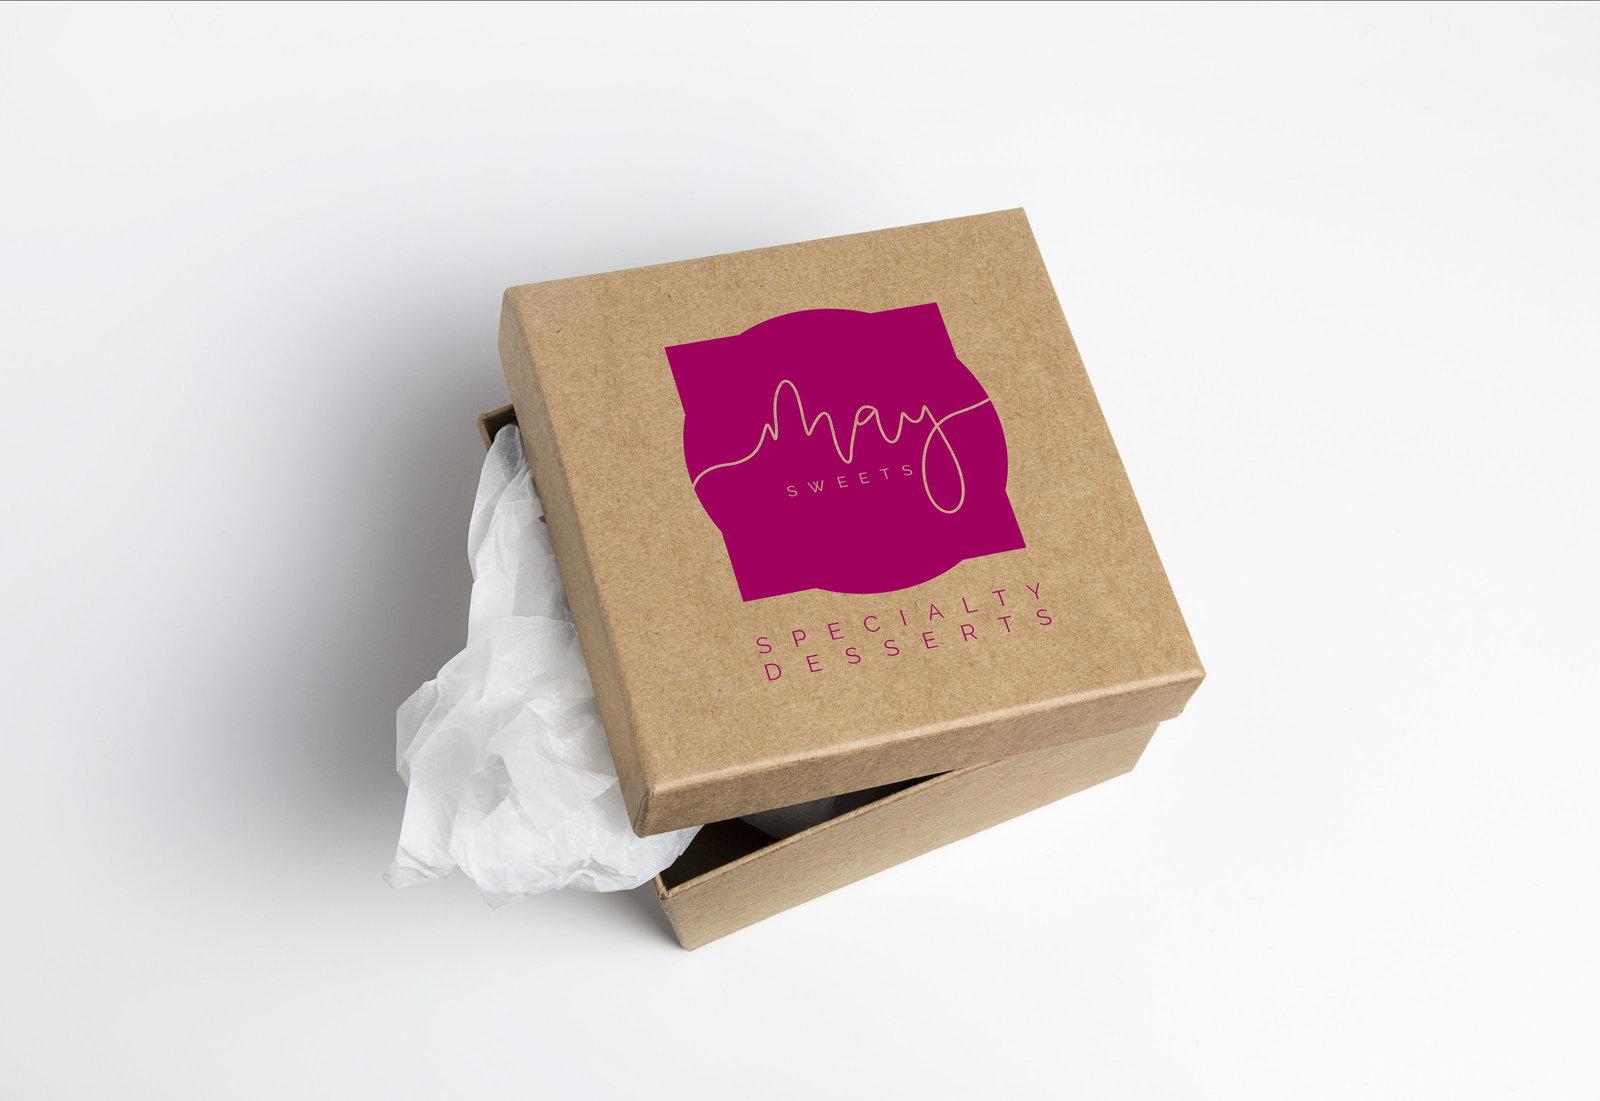 Cardboard Box may sweets